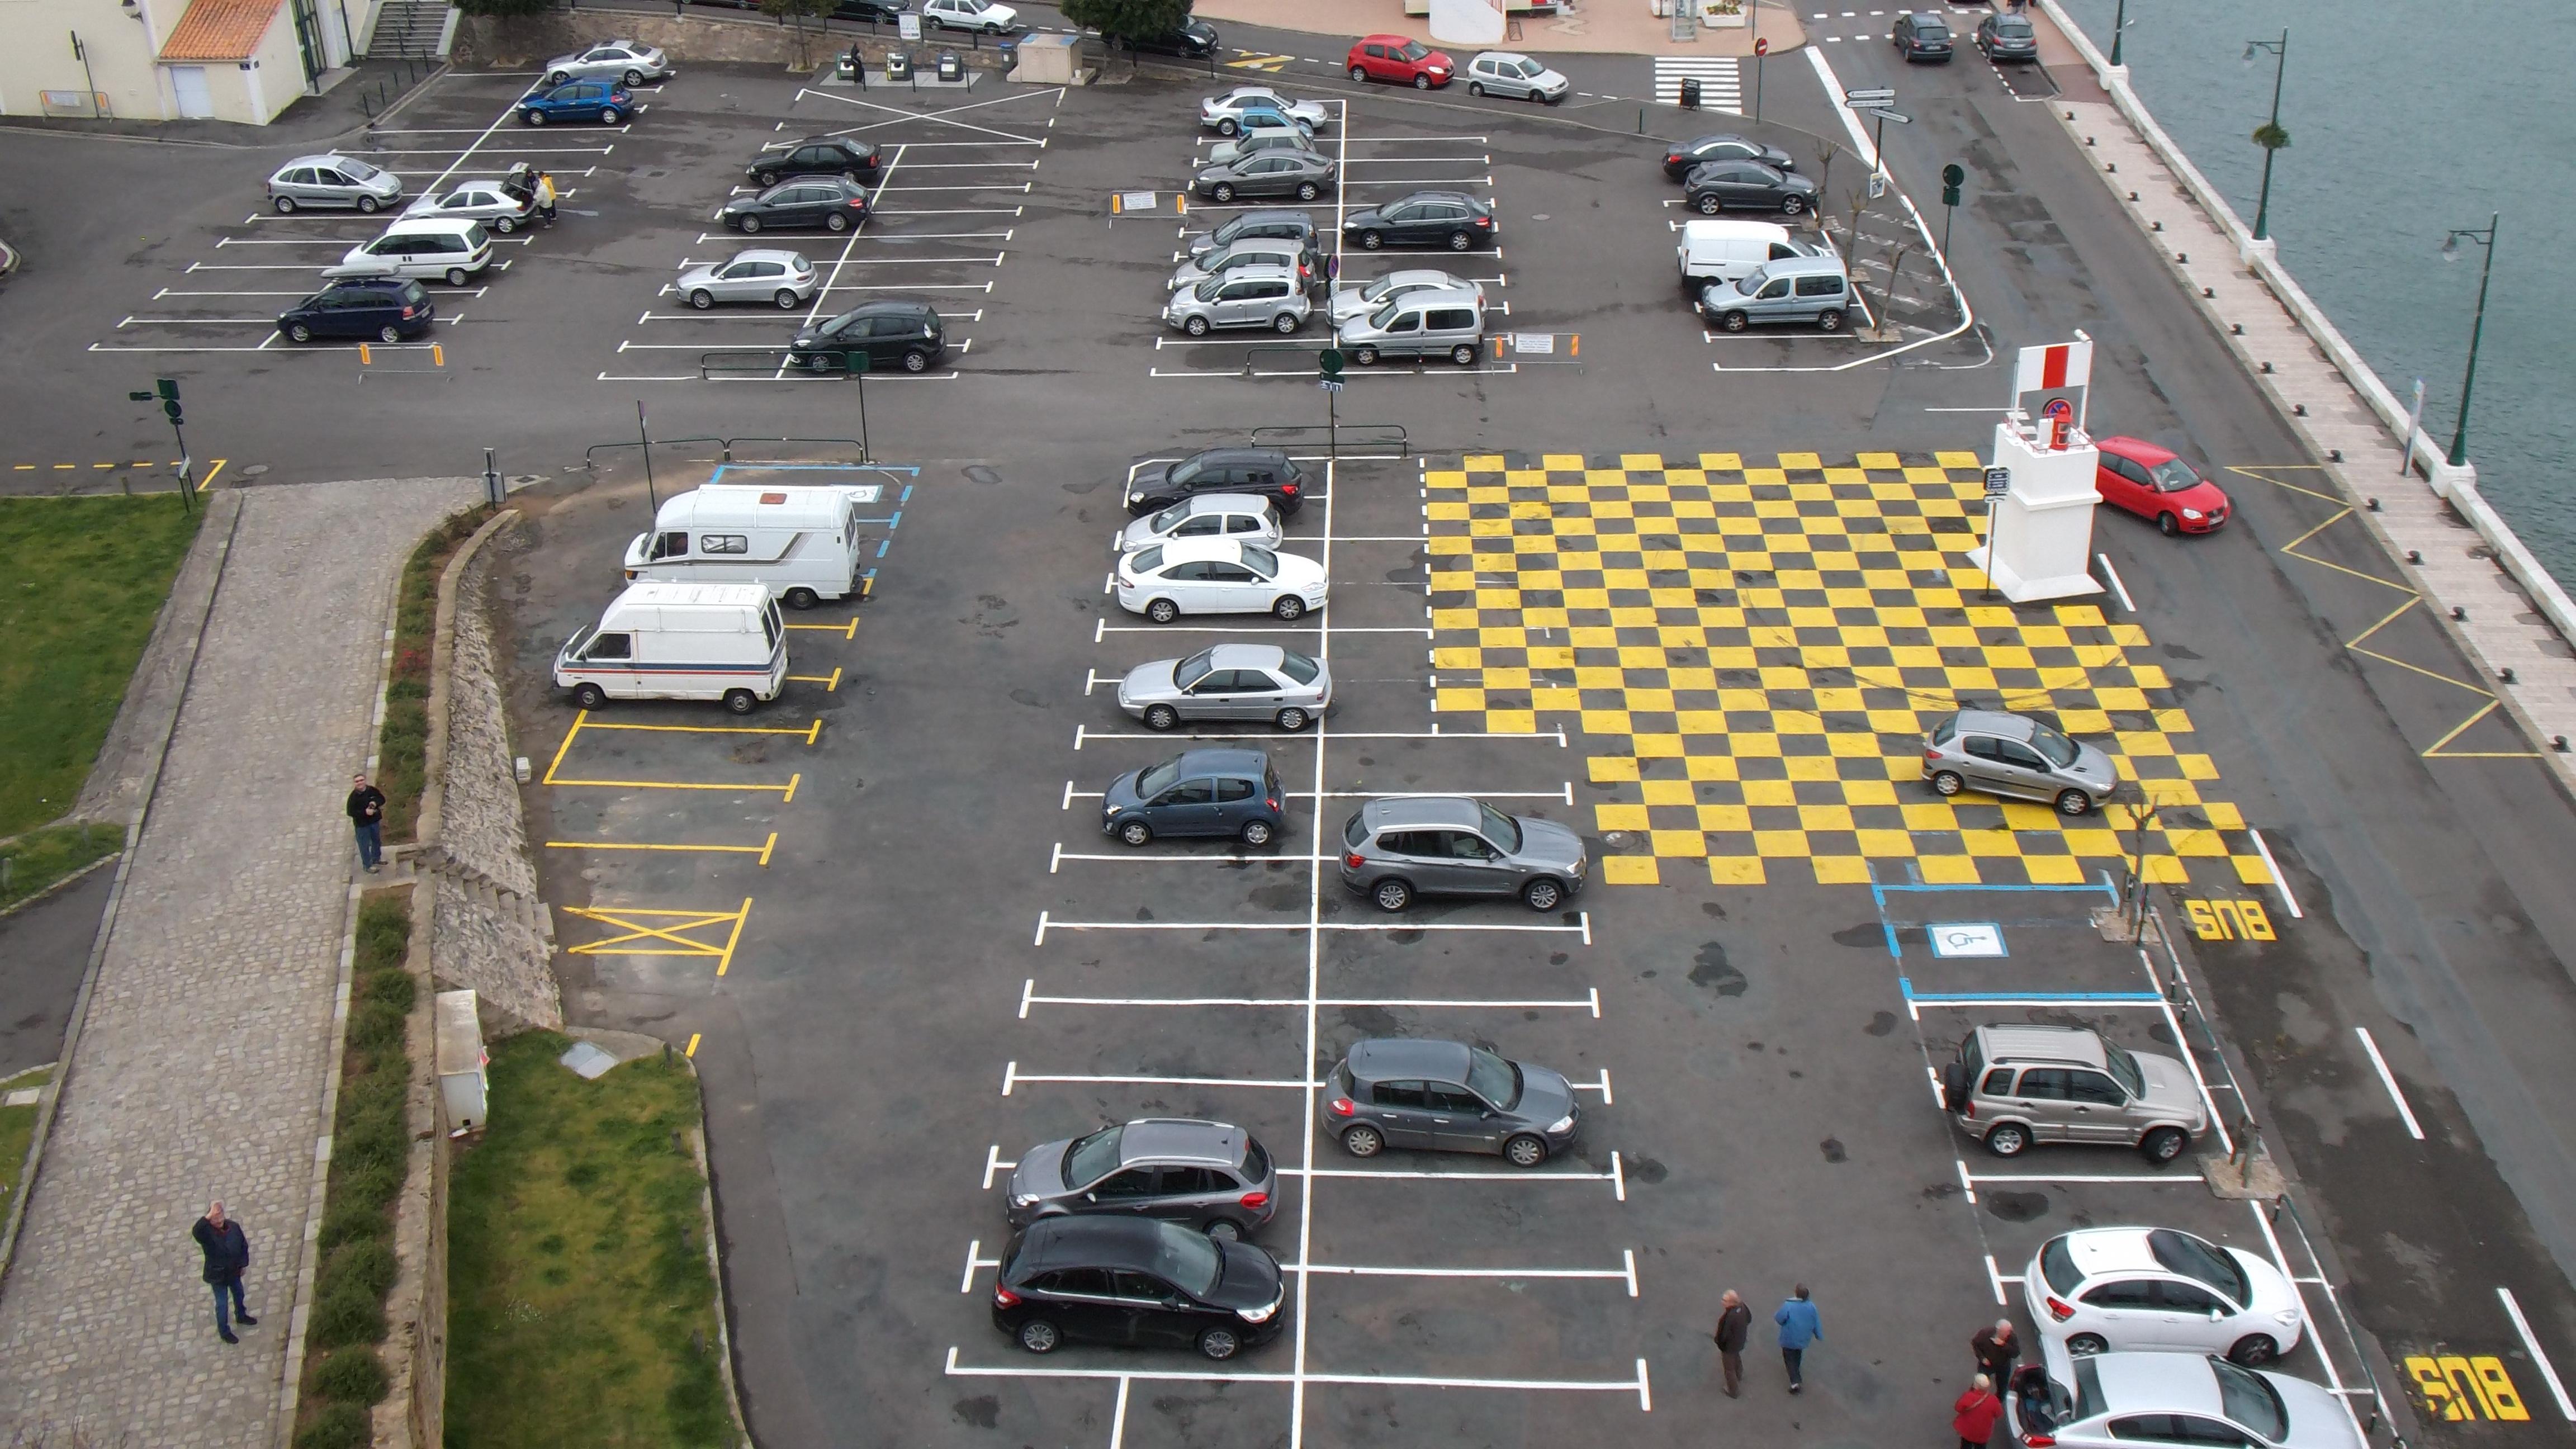 Car parking photo